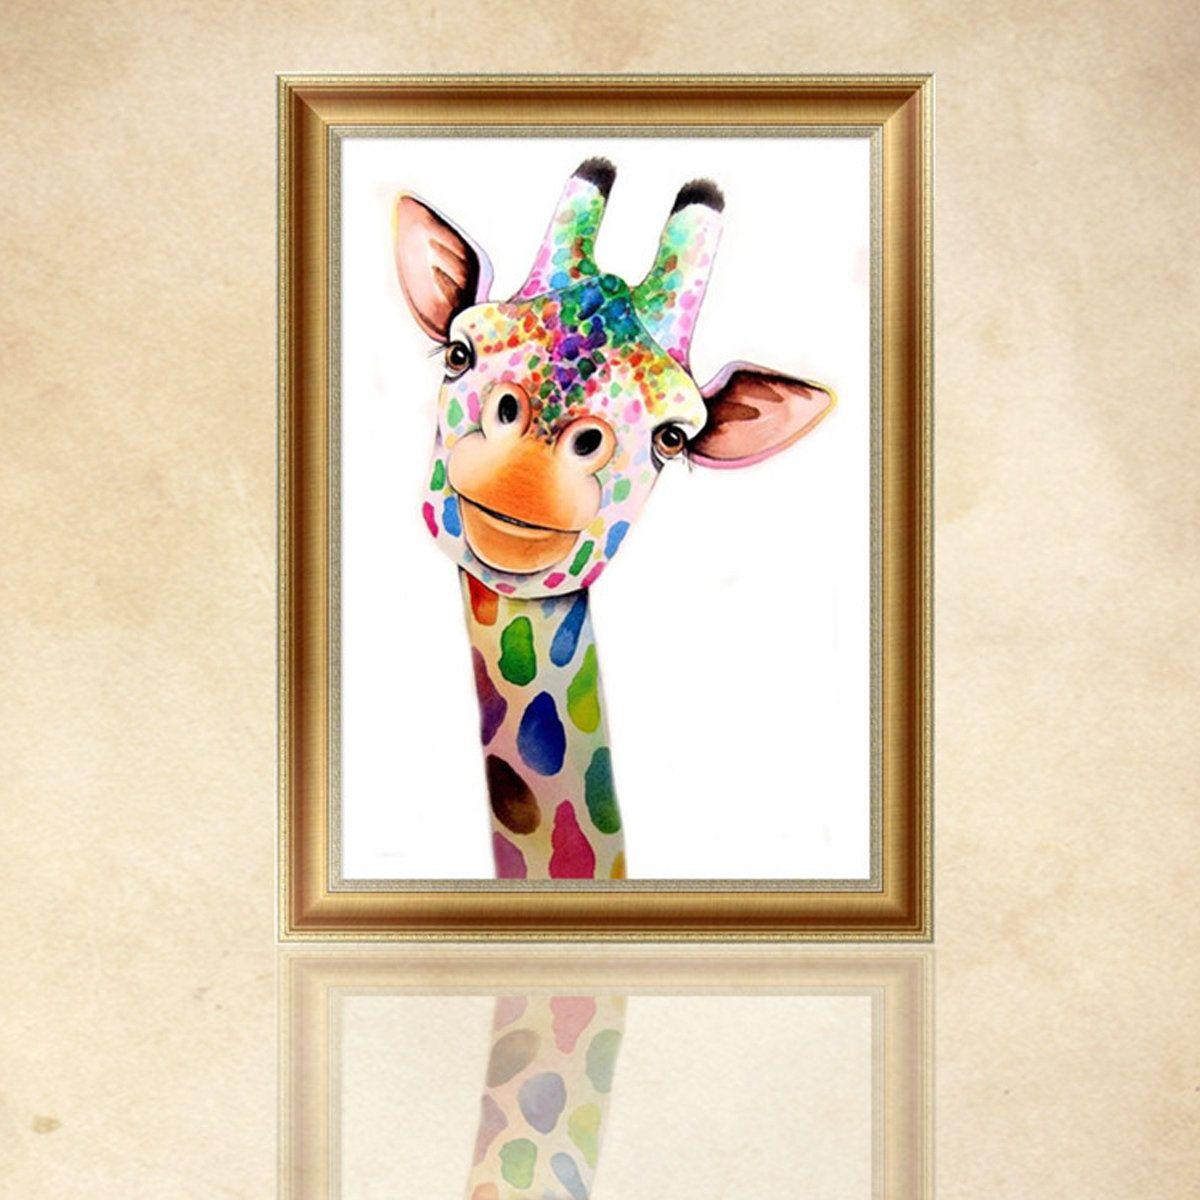 Cartoon Giraffe 5D-Diamond DIY Embroidery Painting Cross Stitch Craft Home-Decor